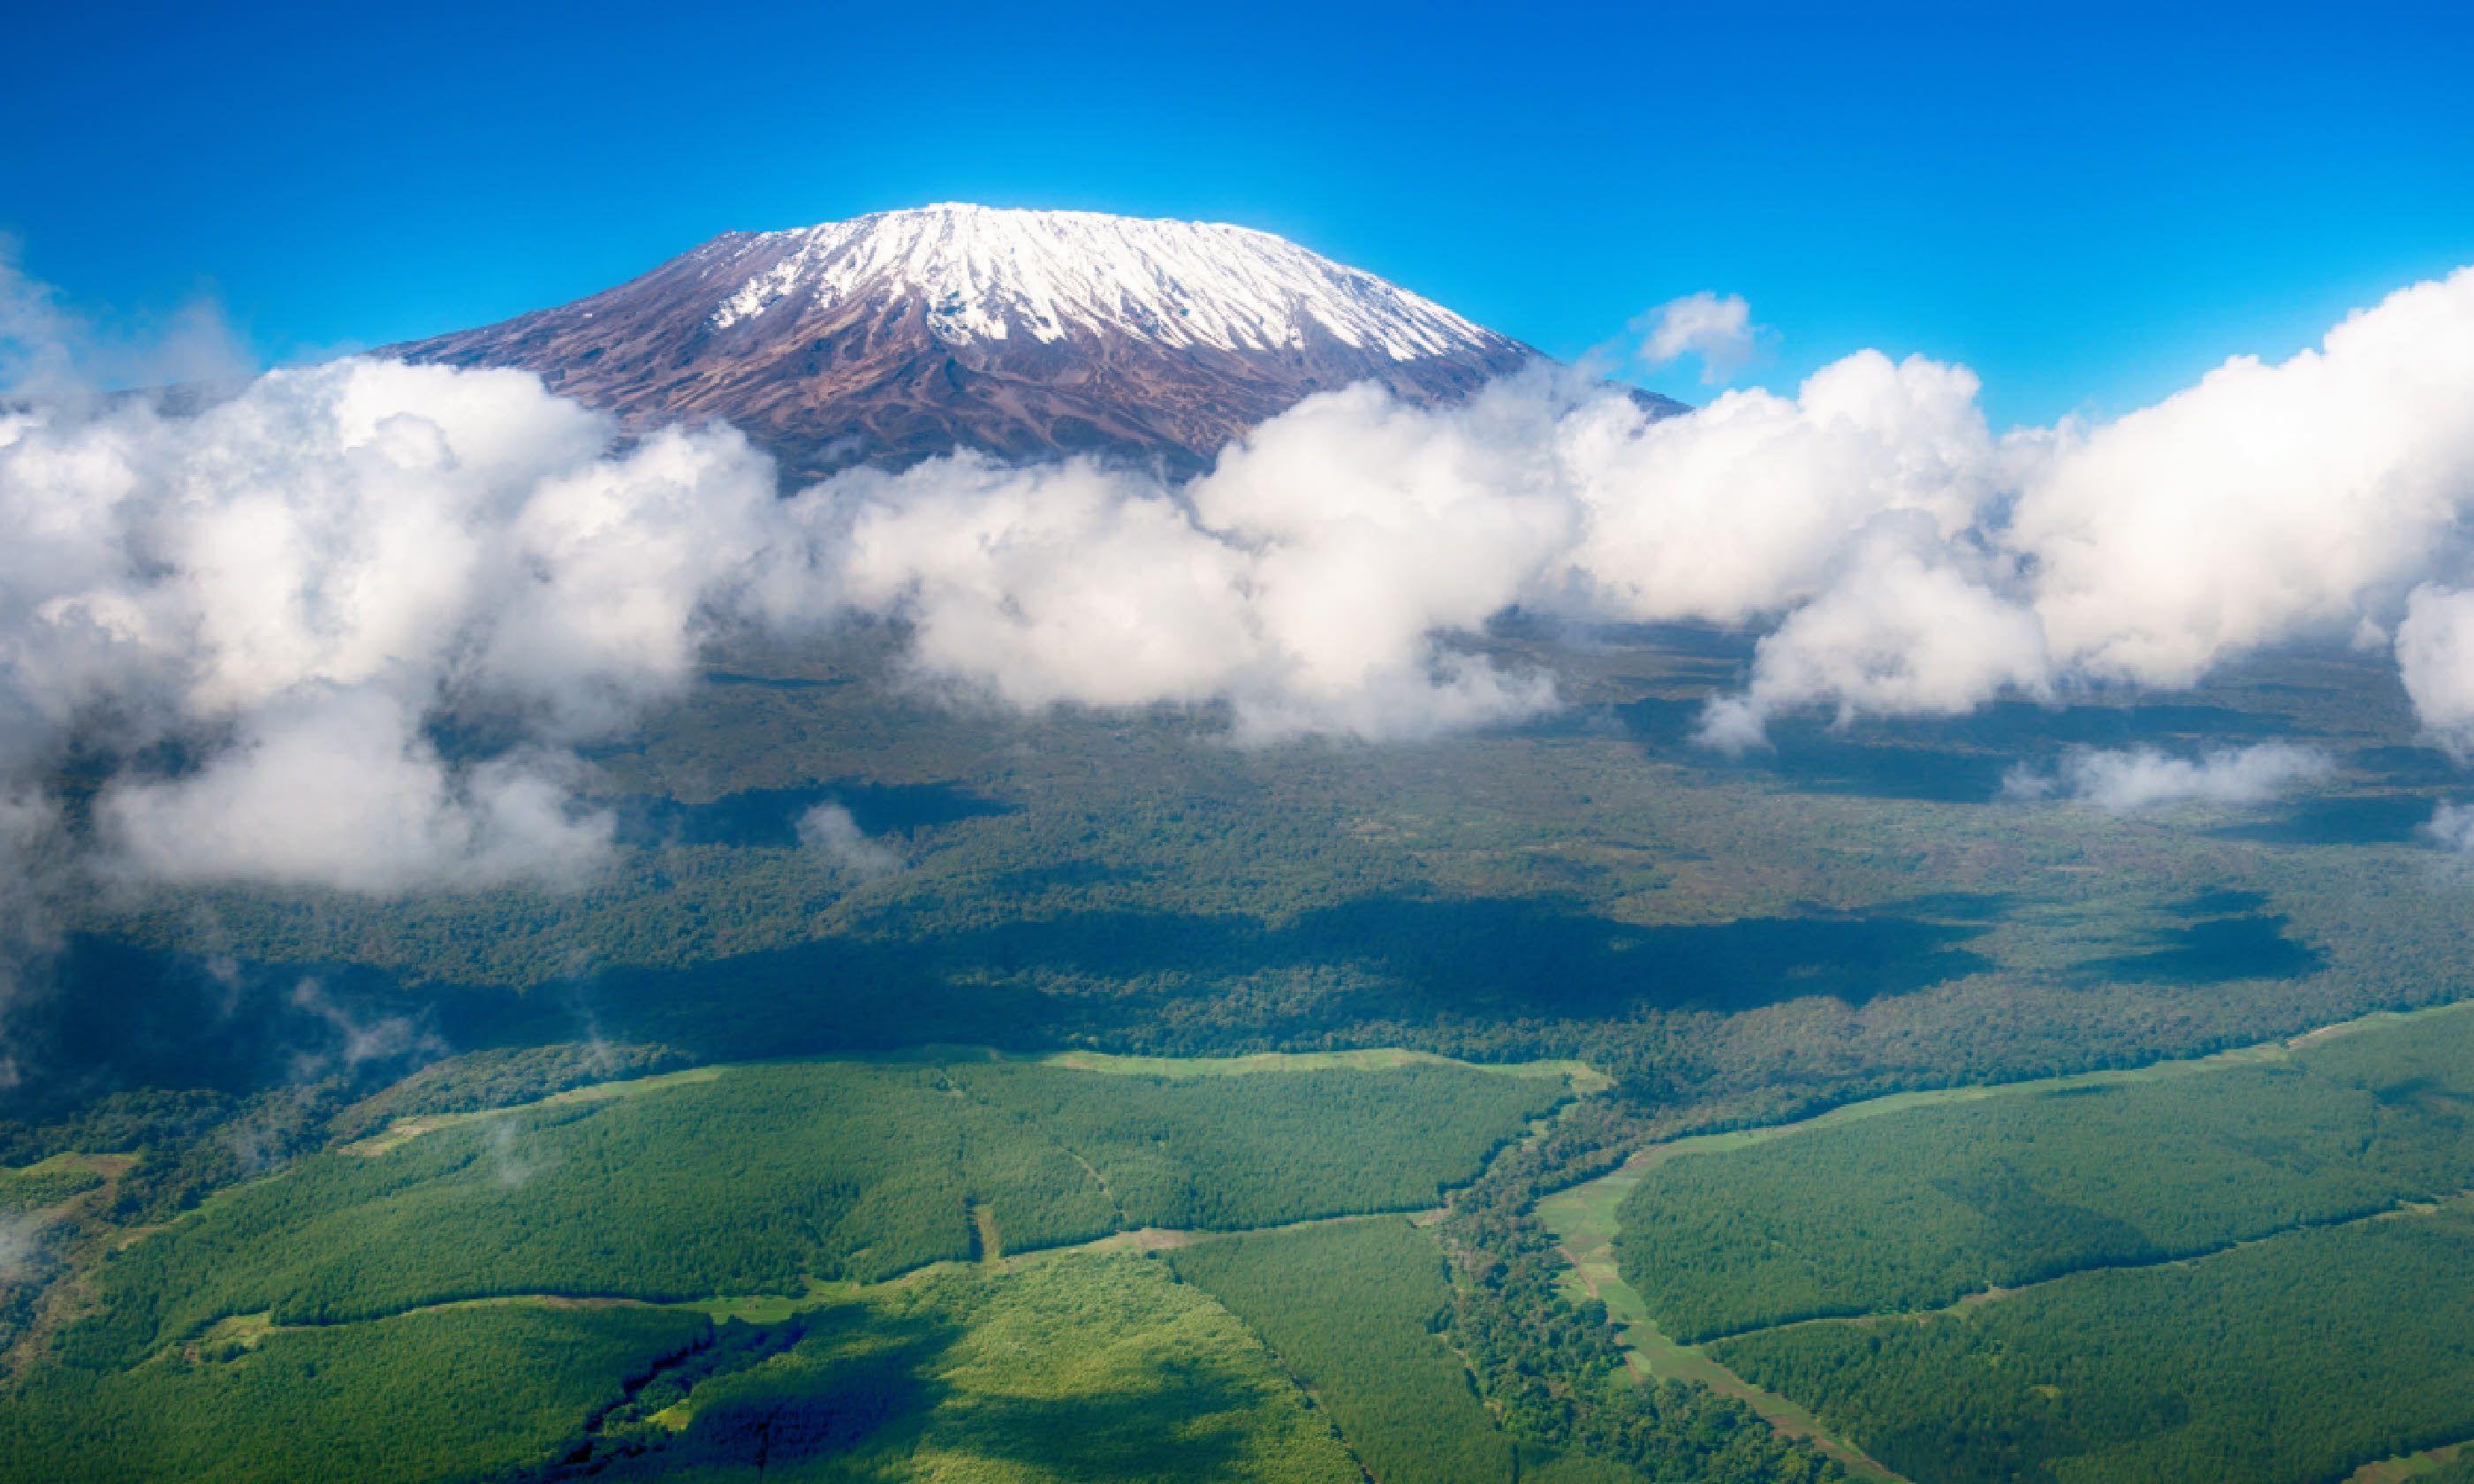 Aerial view of Mount Kilimanjaro (Shutterstock)